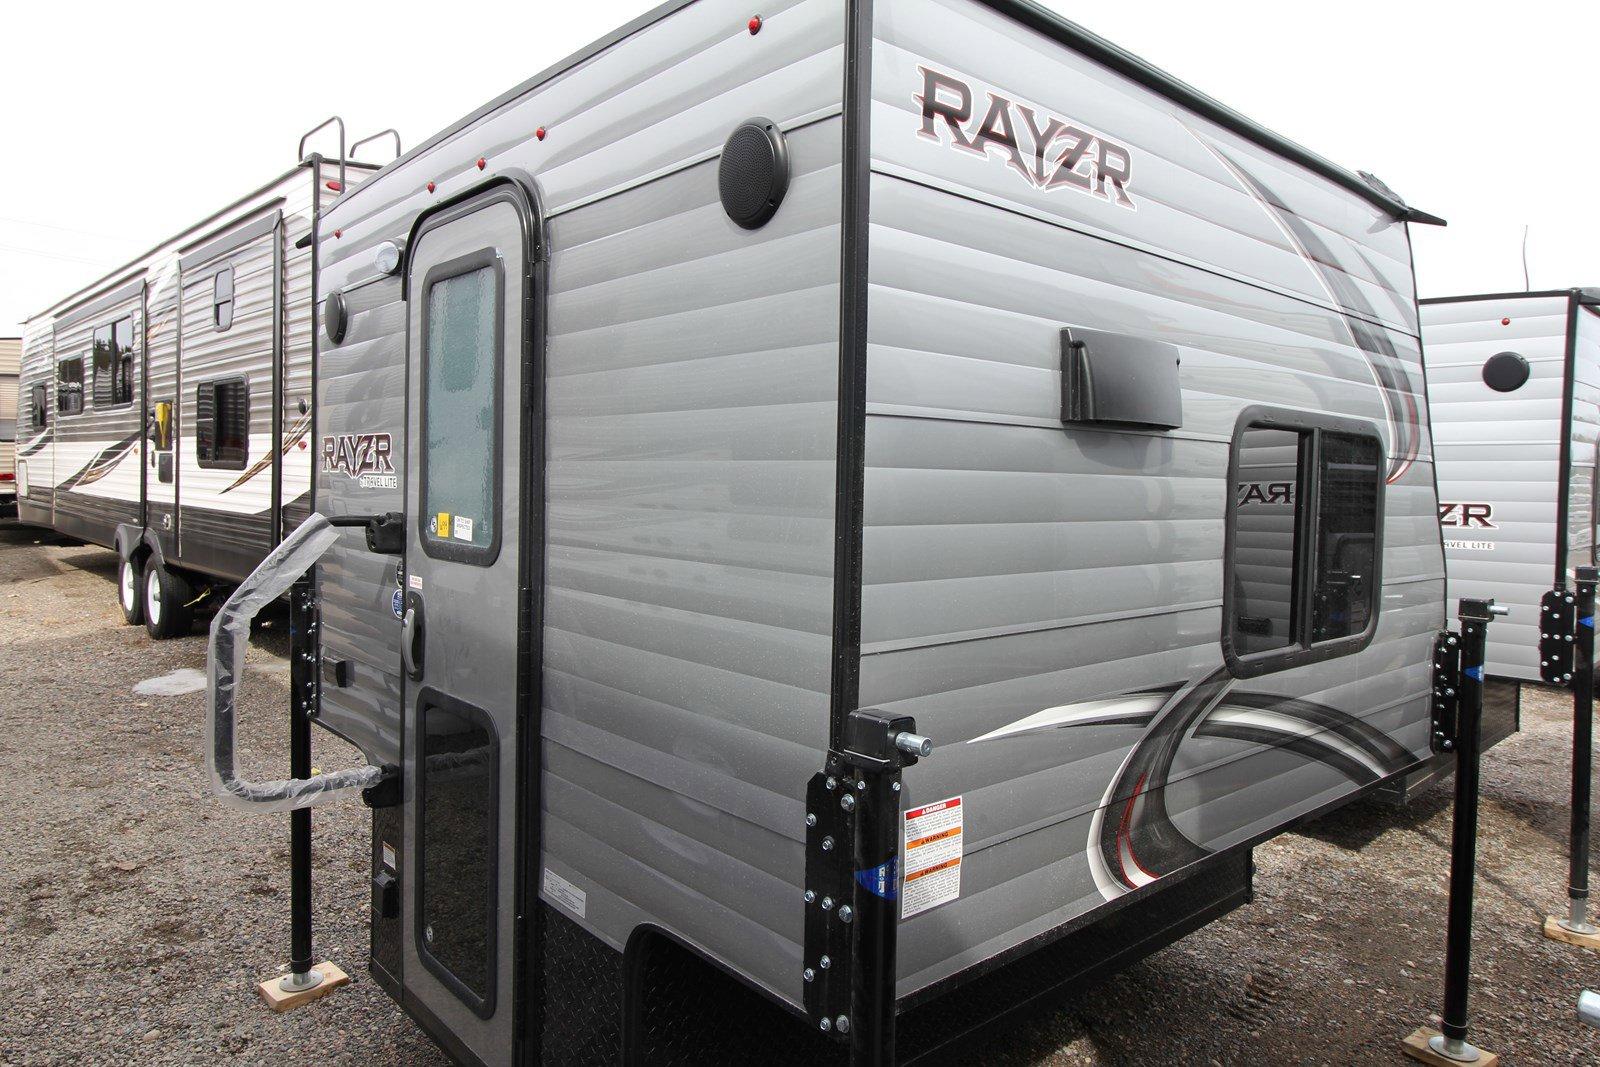 2020 Travel Lite Rayzr FB